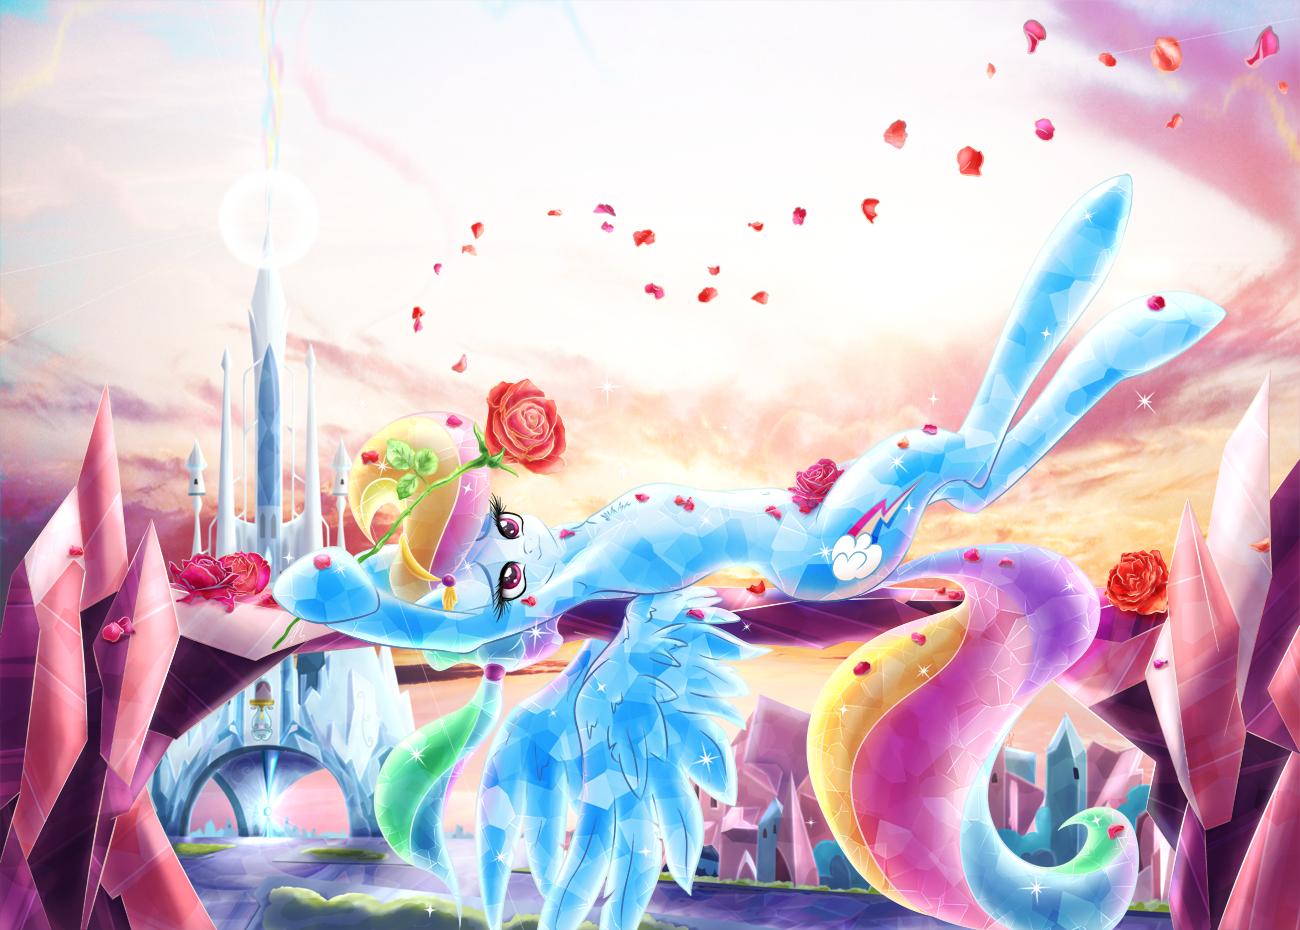 Crystal Roses by lightf4lls